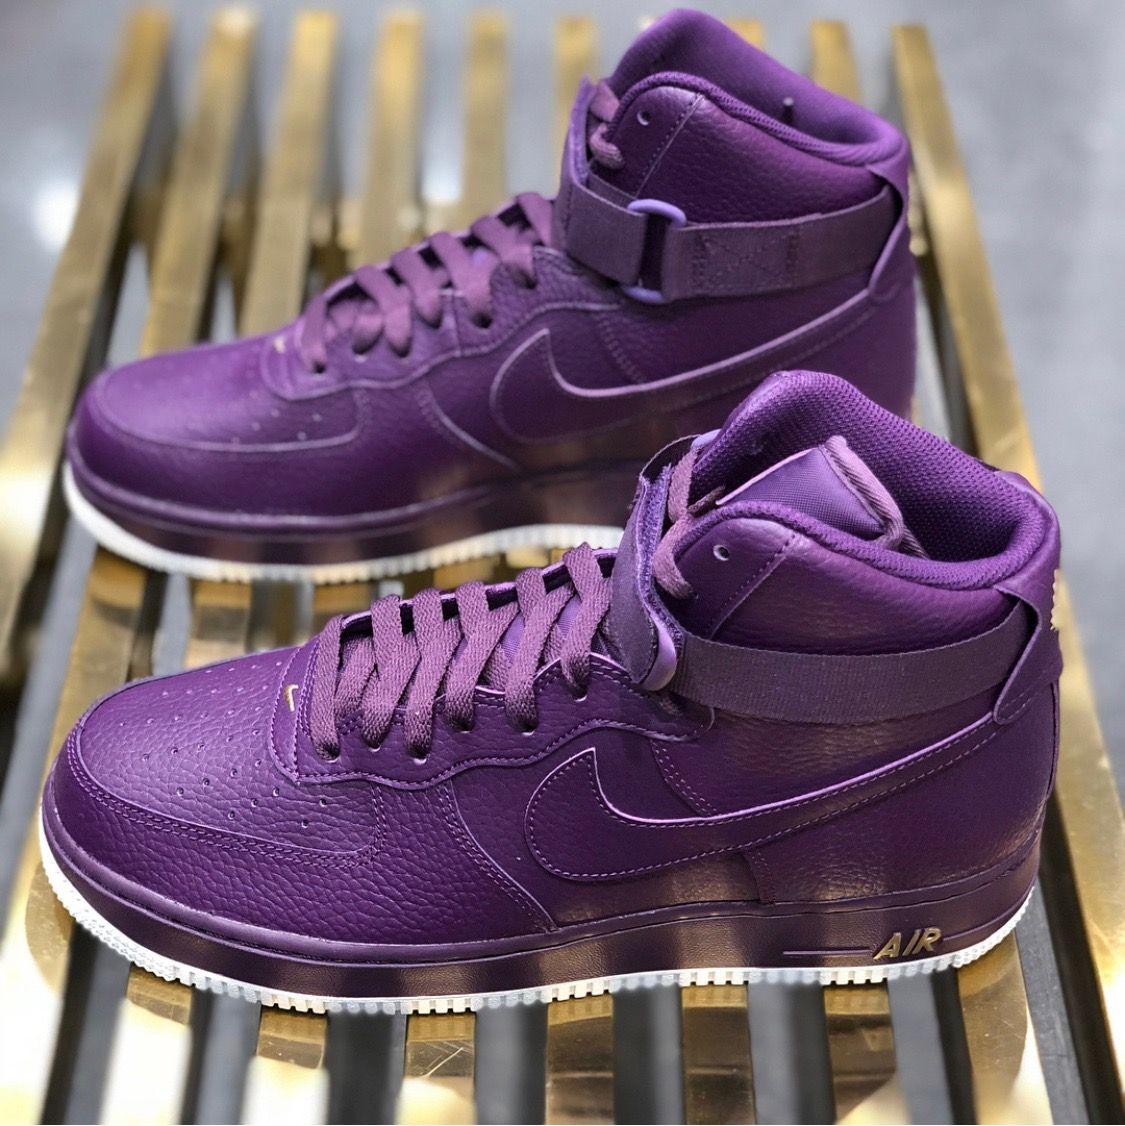 the latest d6c66 92030 Nike Air Force One high top Purple | Sneak Peak in 2019 ...